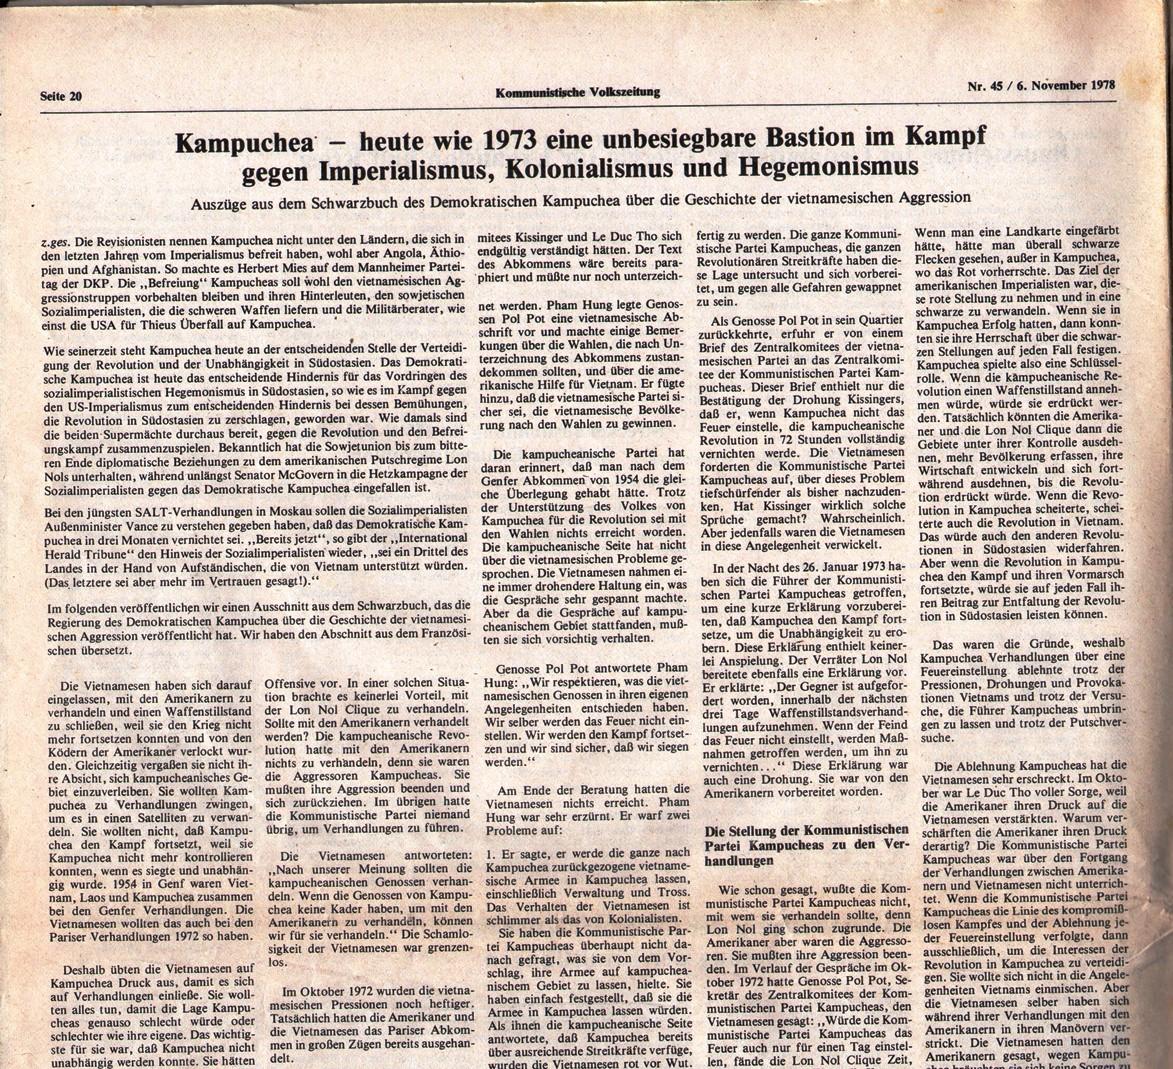 Hamburg_KVZ_1978_45_39